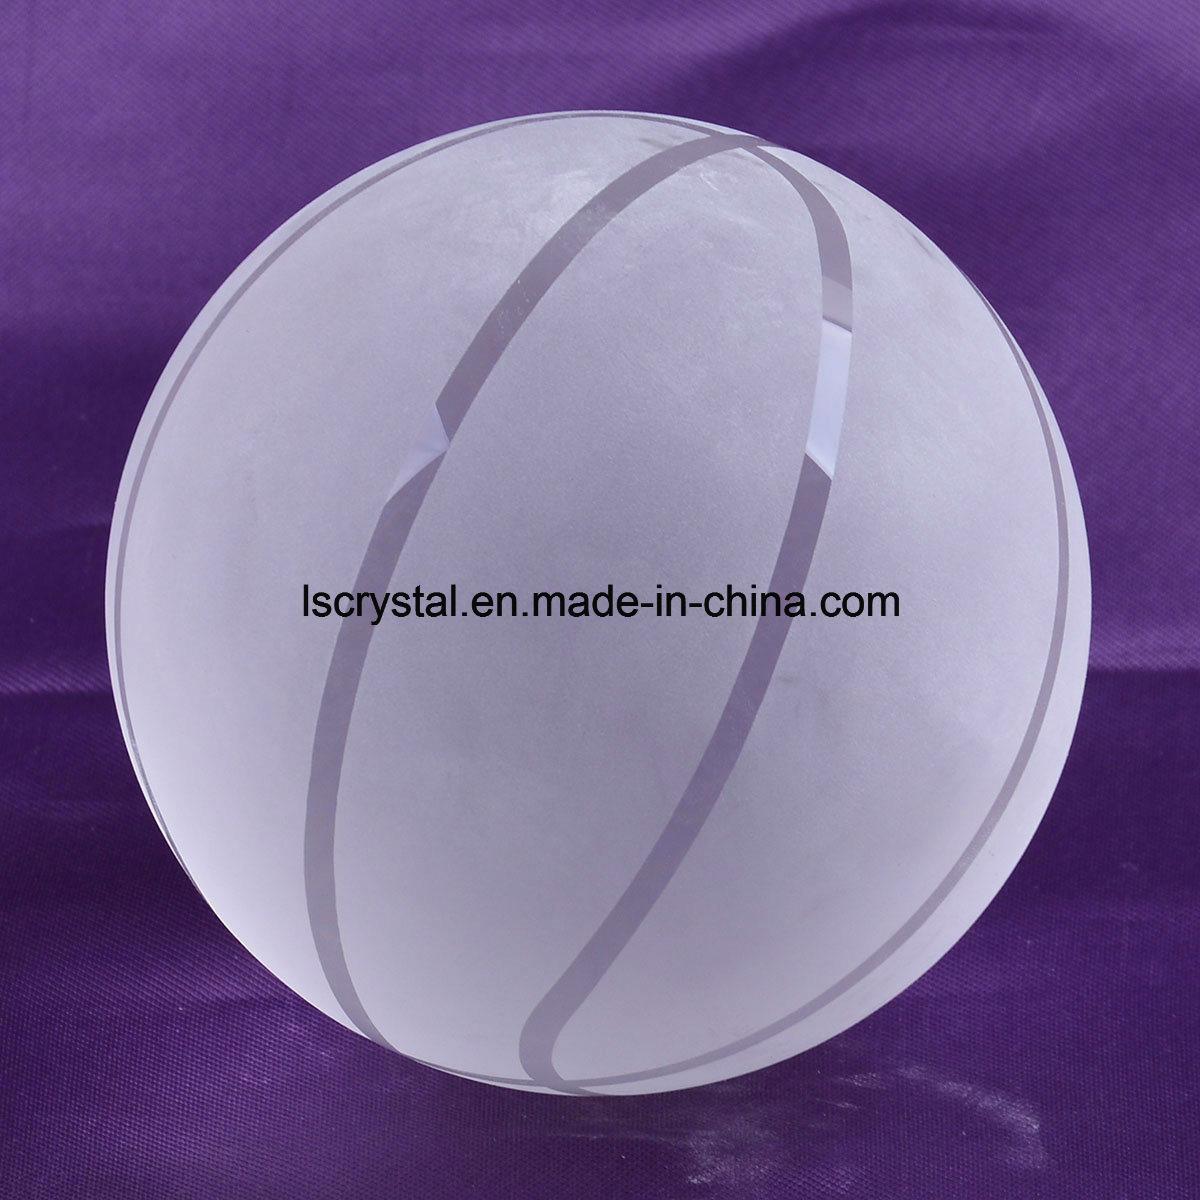 100mm Crystal Clear Glass Basketball for Souvenir Ball